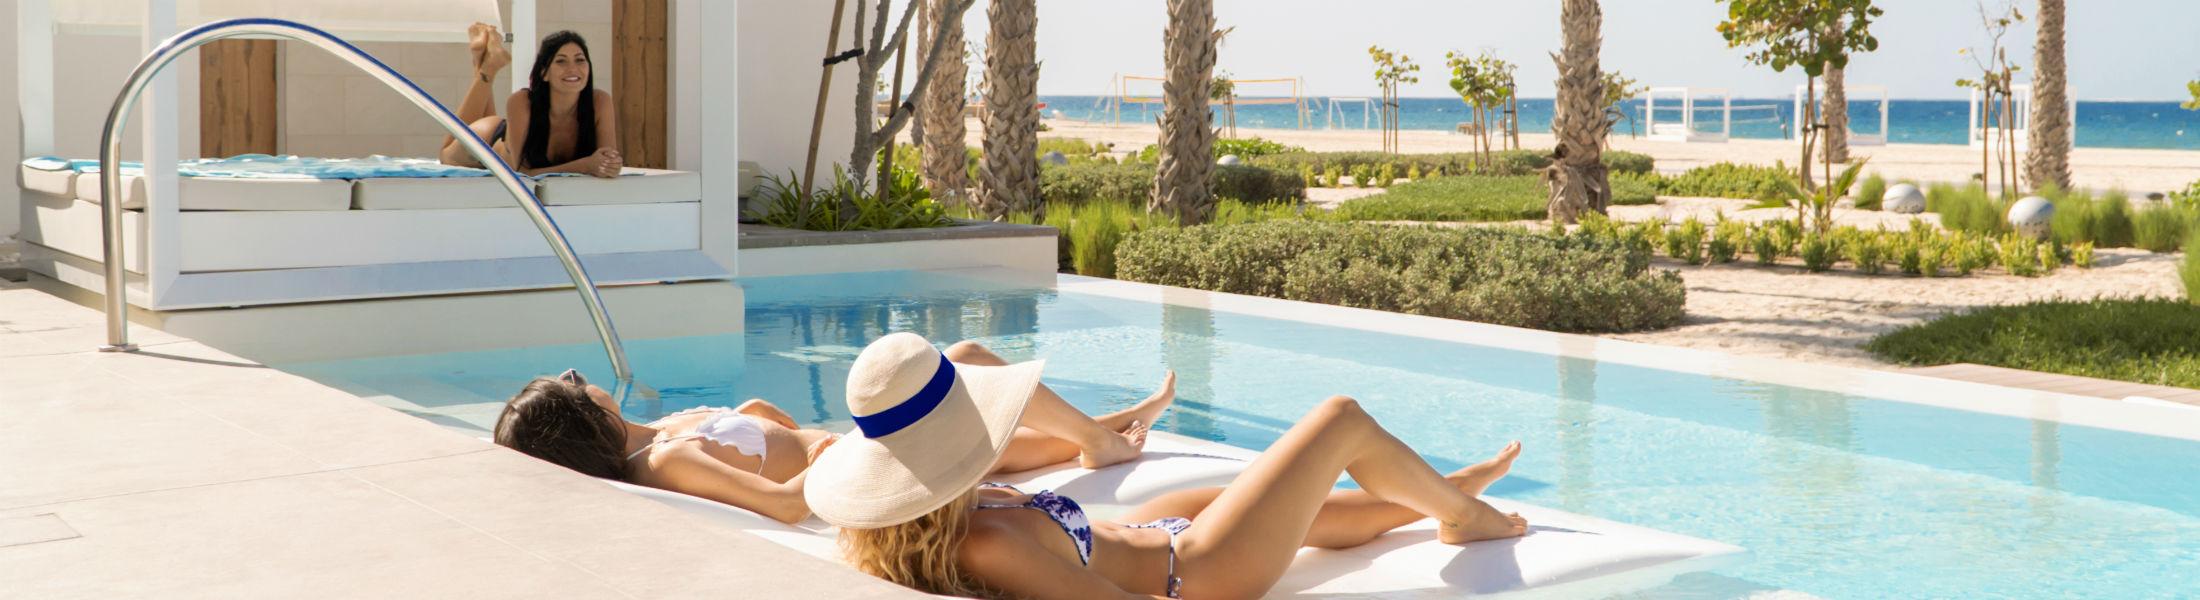 Relaxing at the Beach Villa pool Nikki Beach Resort & Spa Dubai